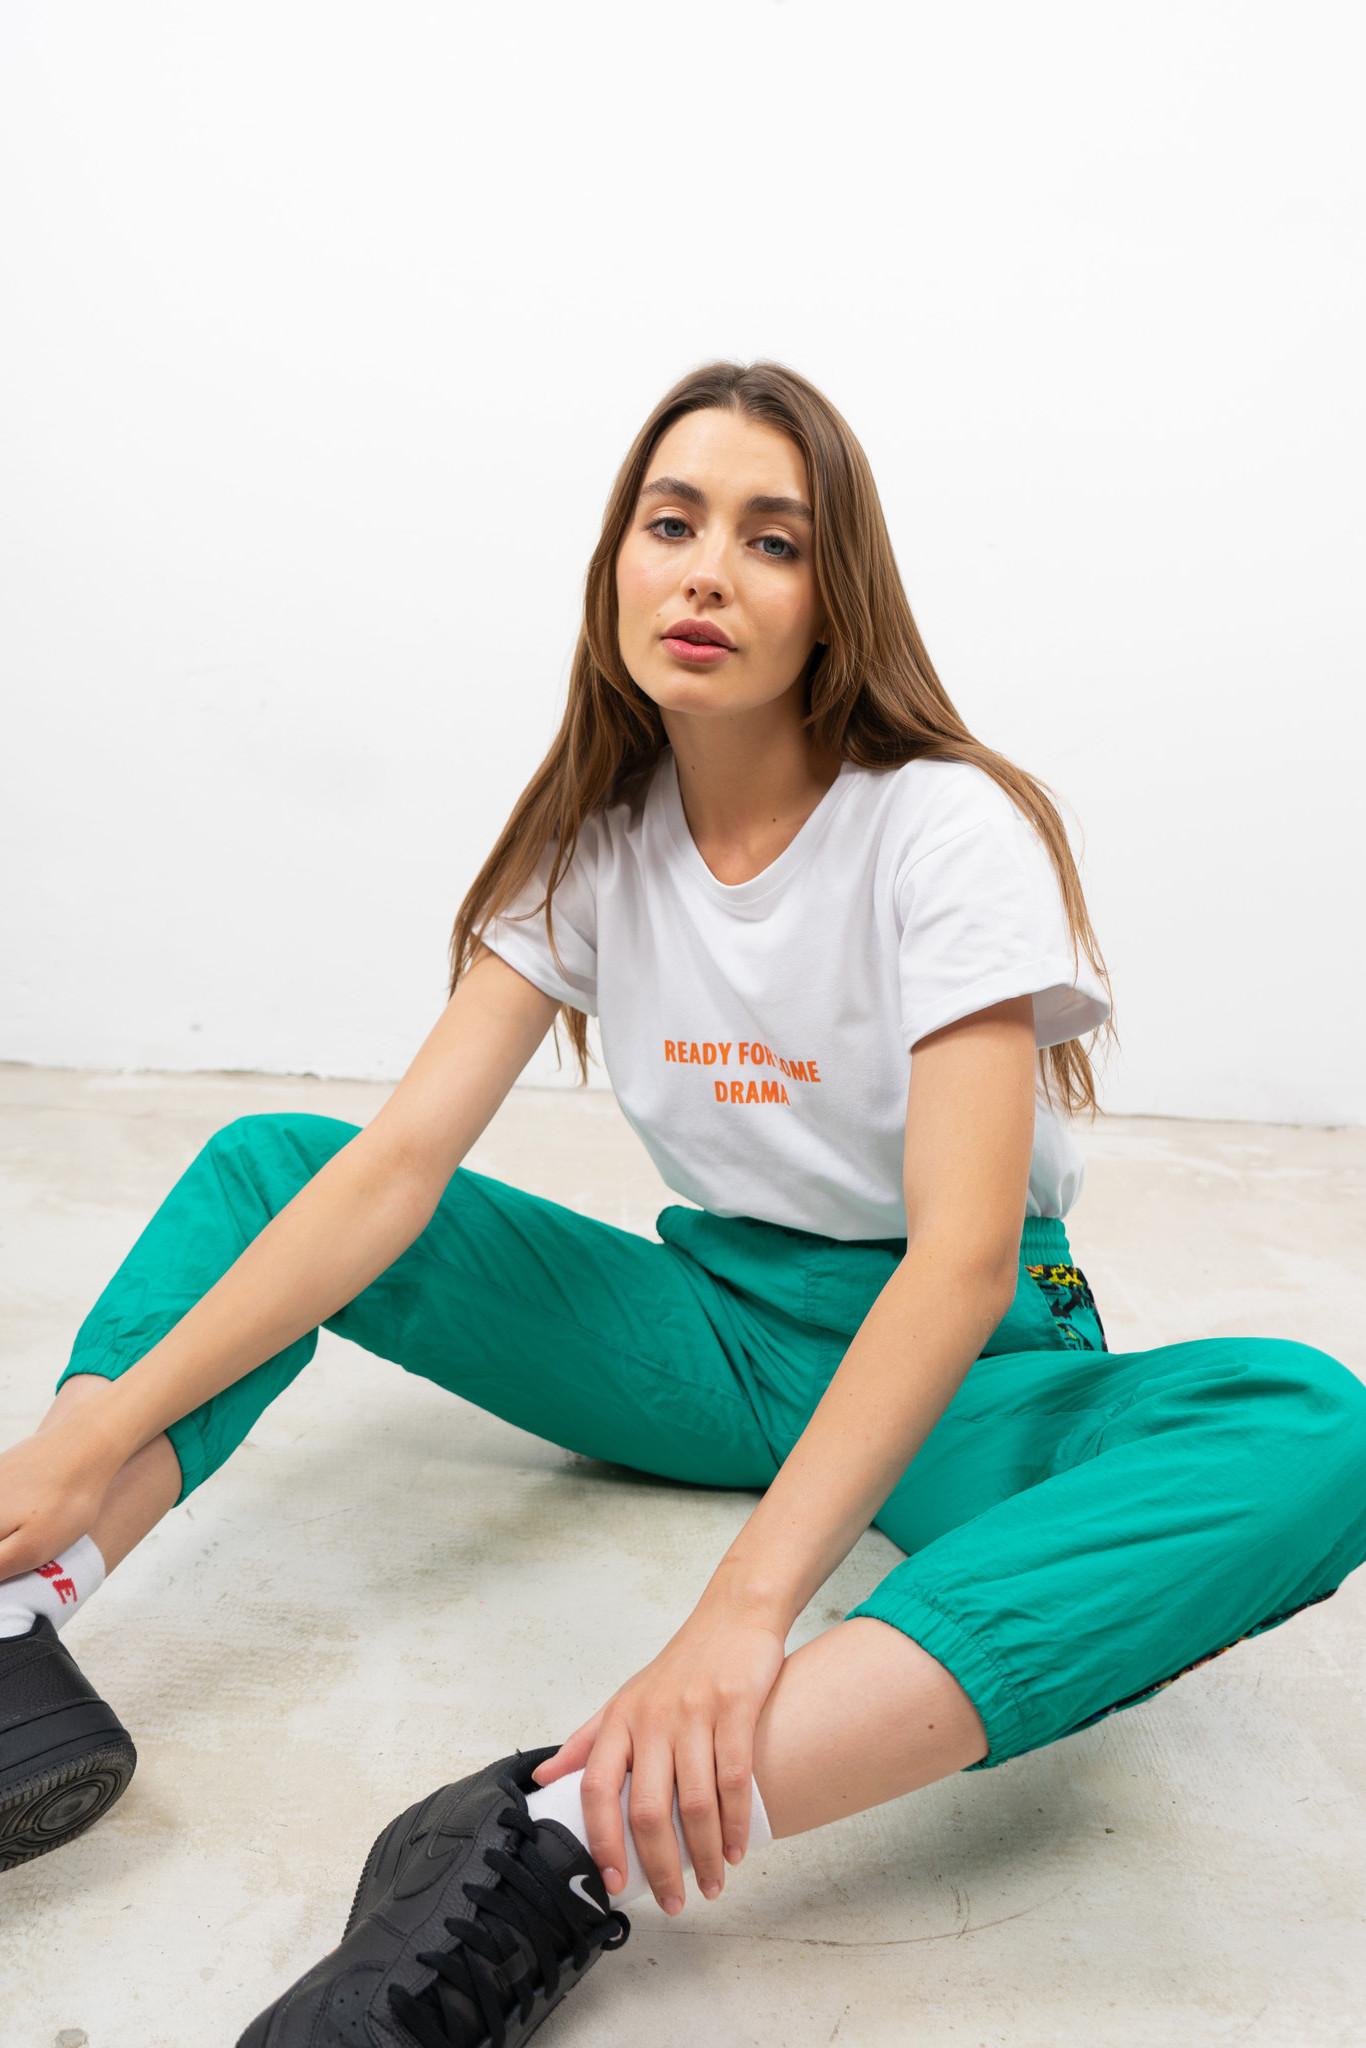 Biała koszulka nadruk Drama White Oversized T-shirt - whysoserious | JestemSlow.pl